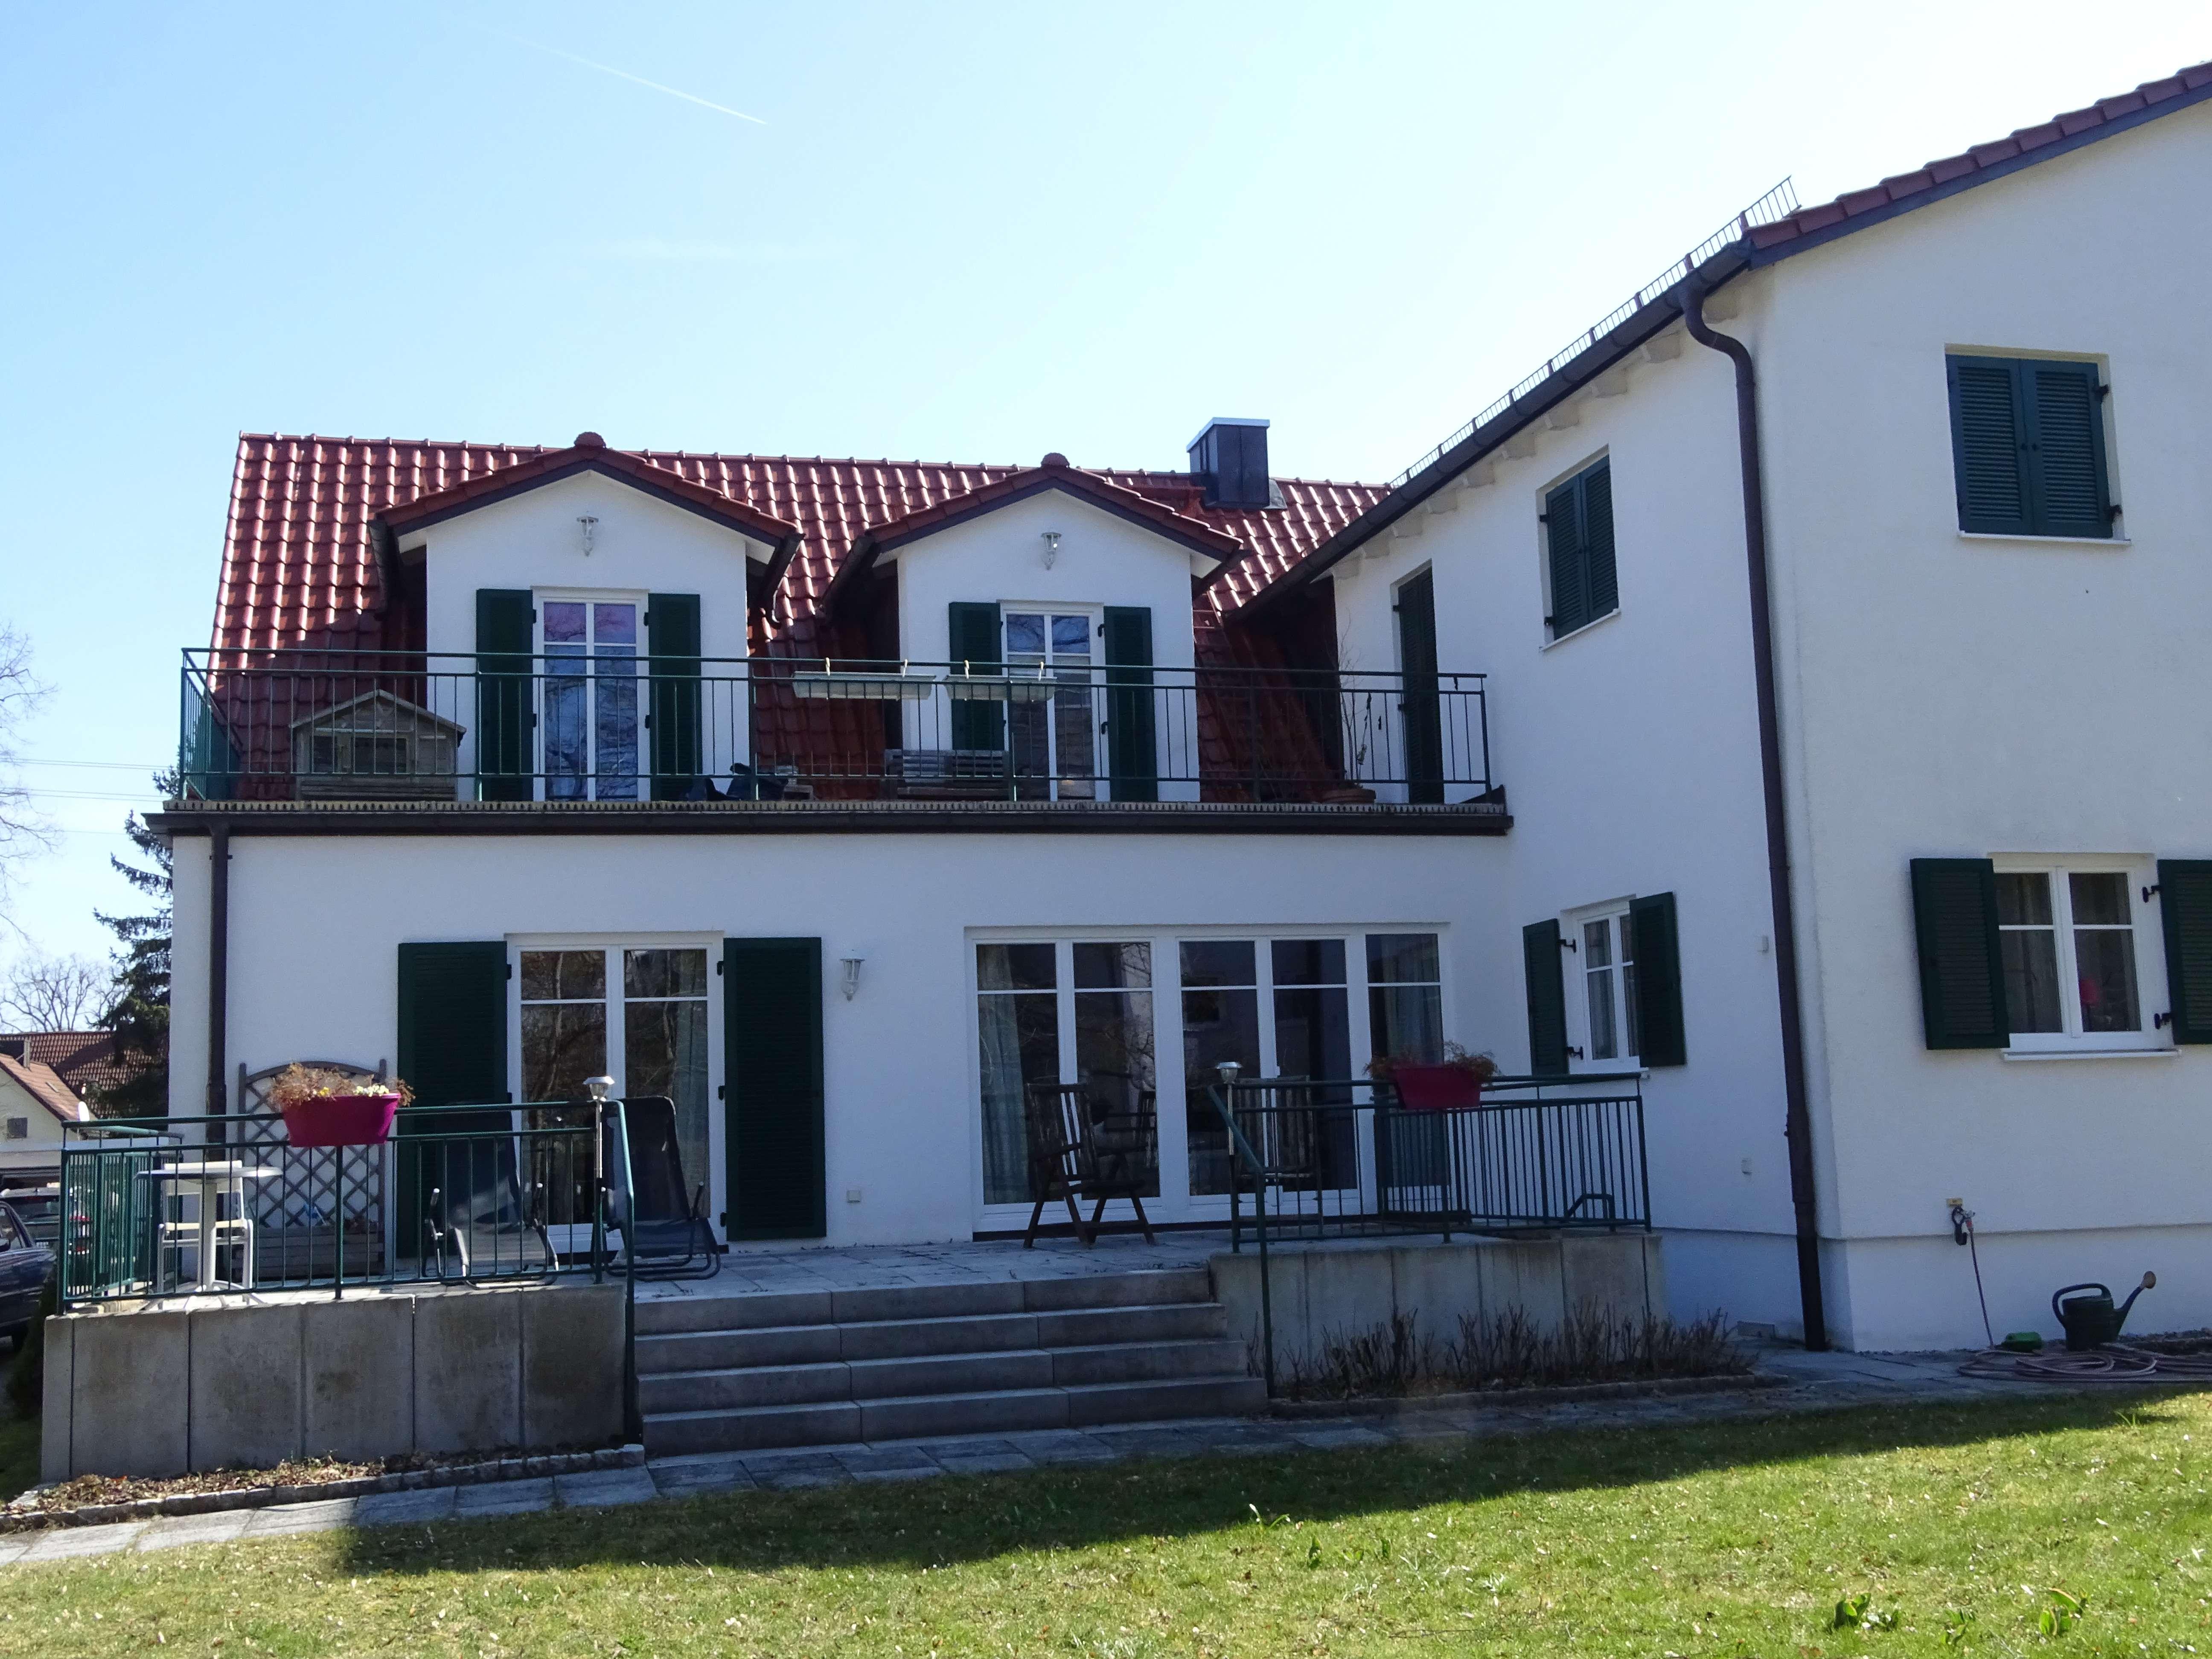 Großzügige EG-Wohnung in DHH in Germering, sofort beziehbar in Germering (Fürstenfeldbruck)